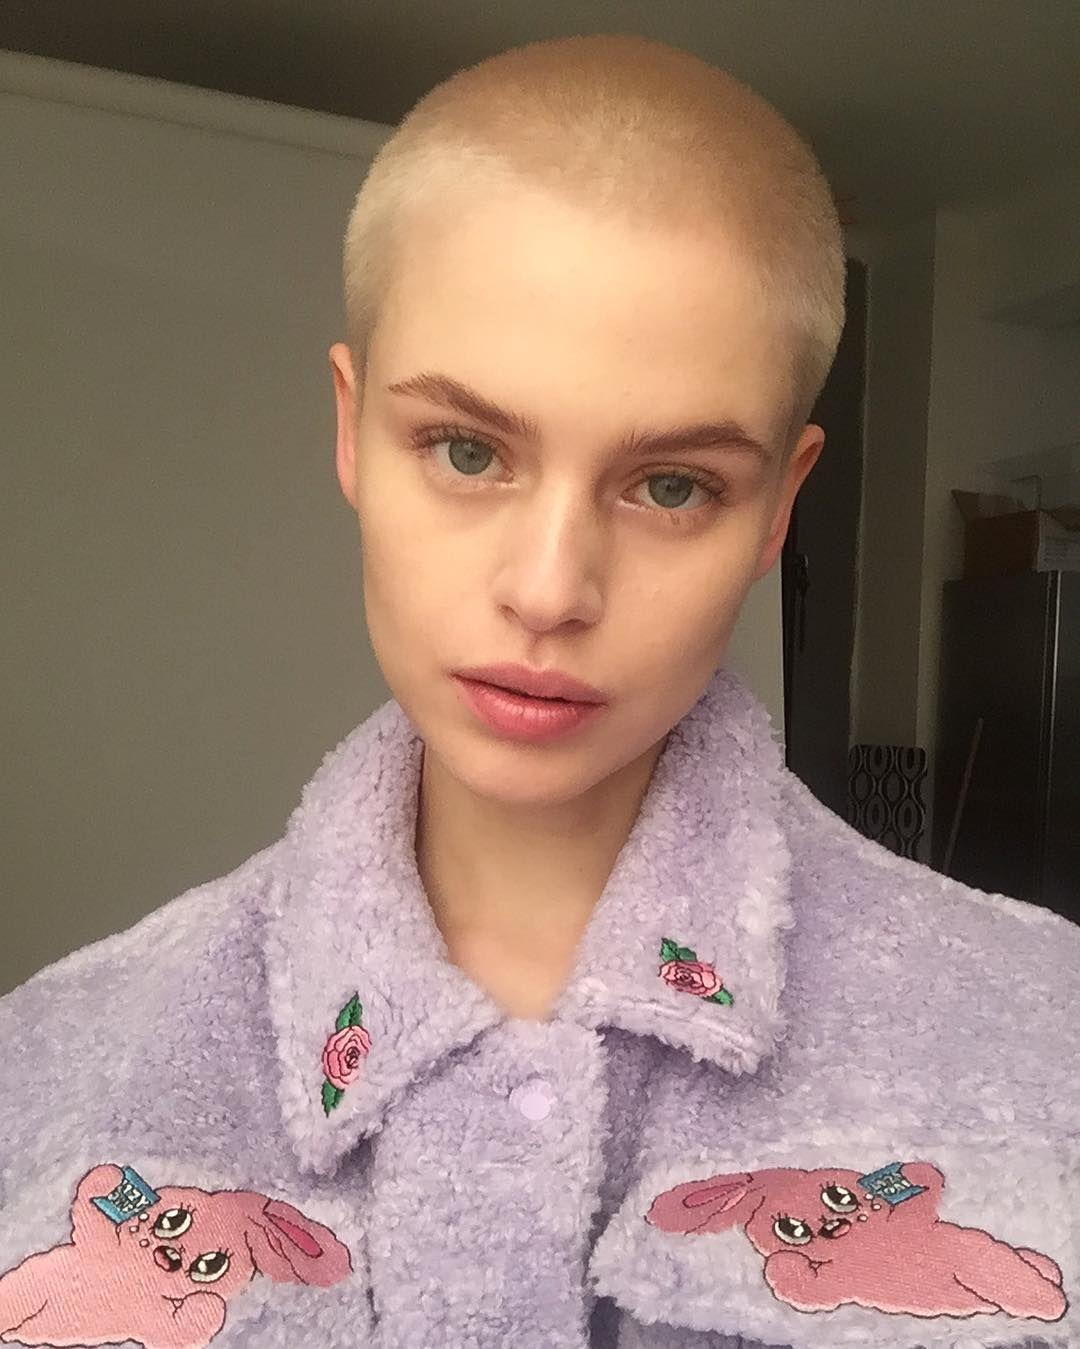 women with buzz cut hairstyles | popsugar celebrity uk